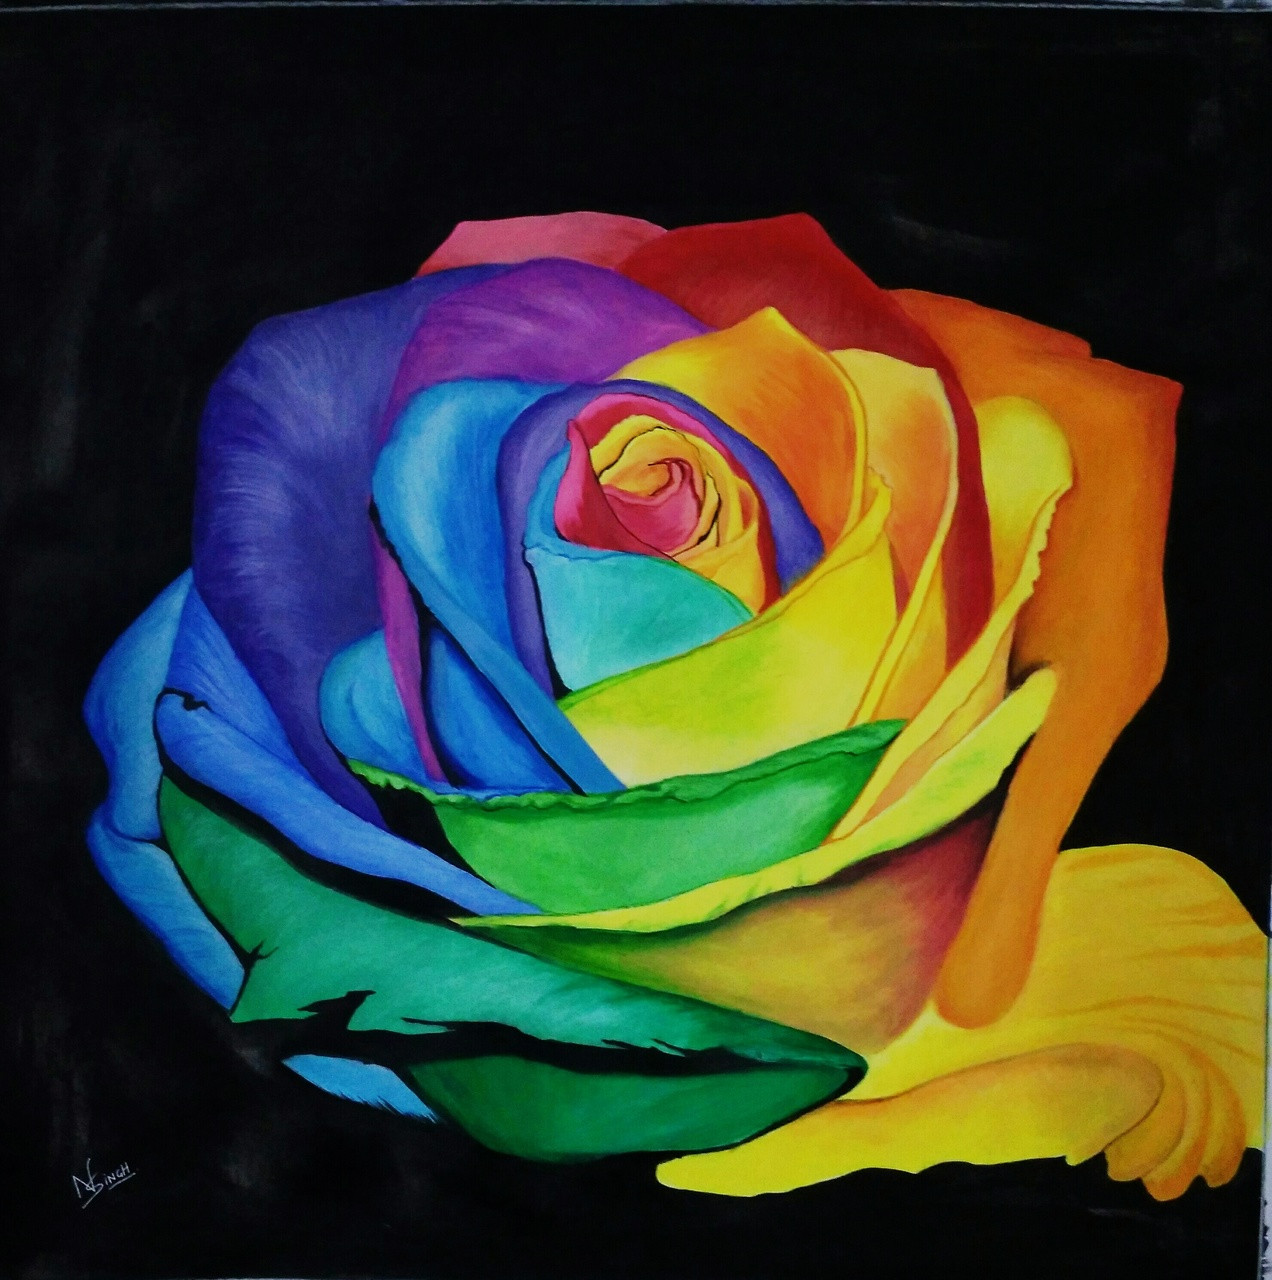 Buy Beautiful Rose Handmade Painting by Nagendra Singh. Code:ART_2819_22493 - Paintings for Sale ...